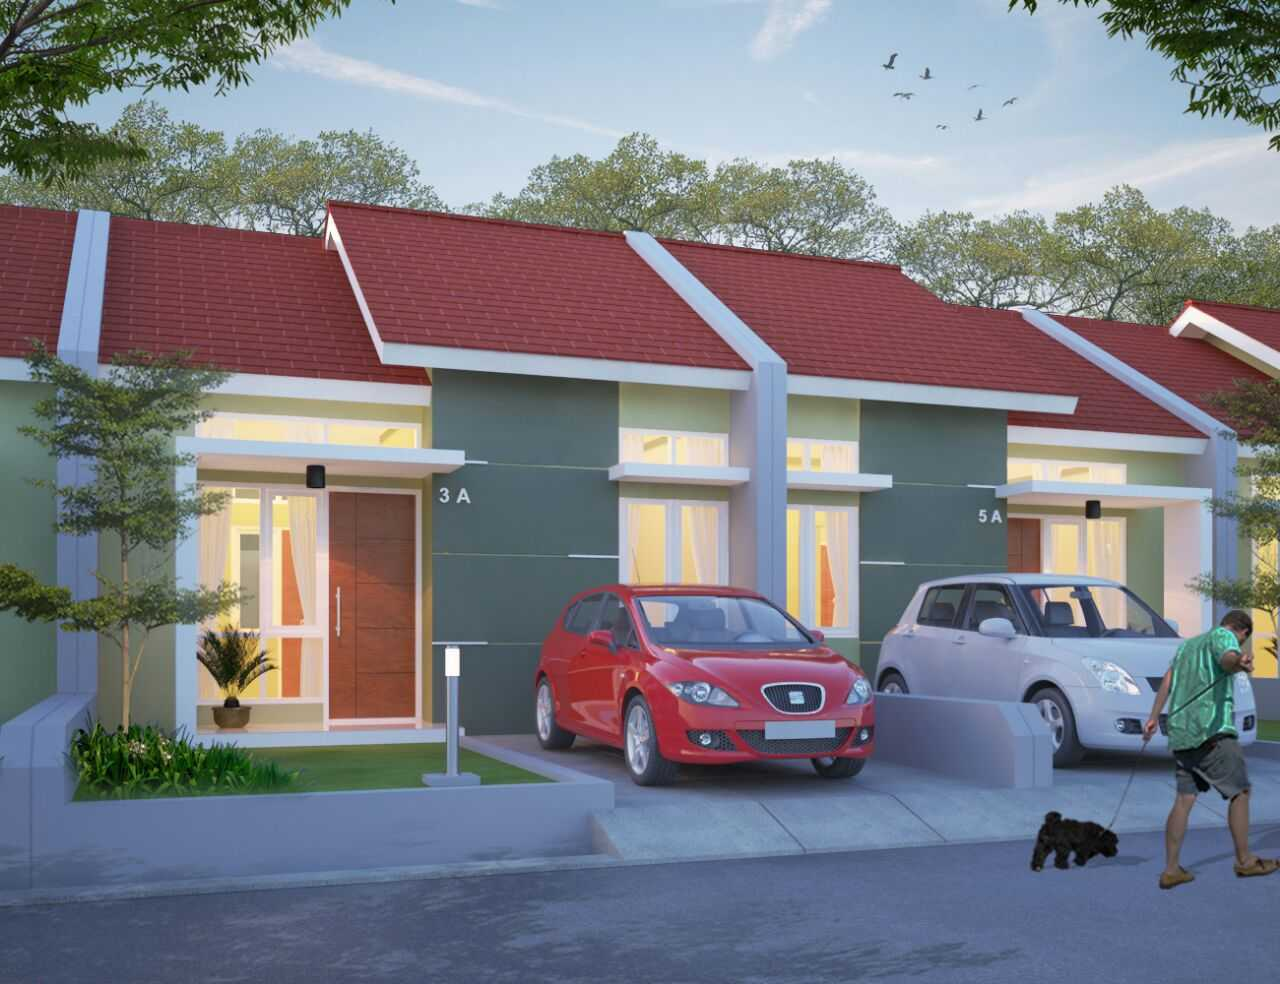 Ady-Studio Grand Depok City Depok, Kota Depok, Jawa Barat, Indonesia Depok, Kota Depok, Jawa Barat, Indonesia Ady-Studio-Grand-Depok-City   55678